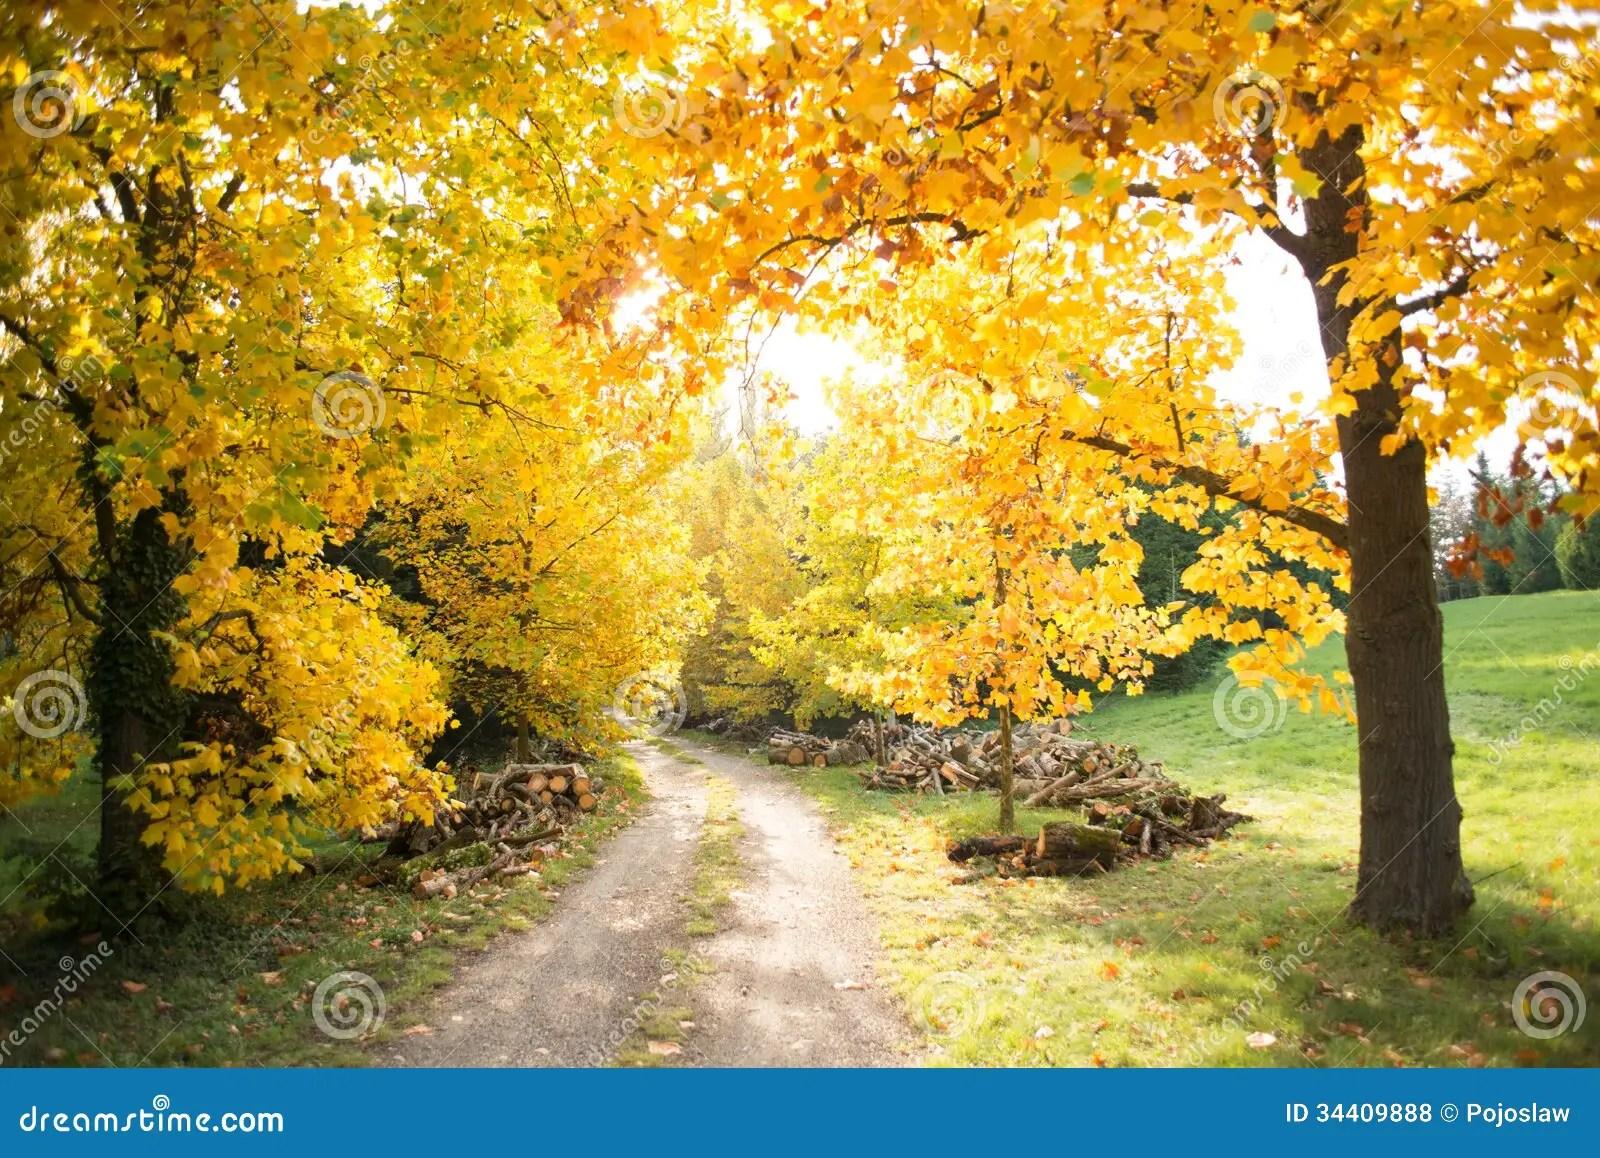 Fall Path Wallpaper Colorful Autumn Stock Photo Image Of Orange Season